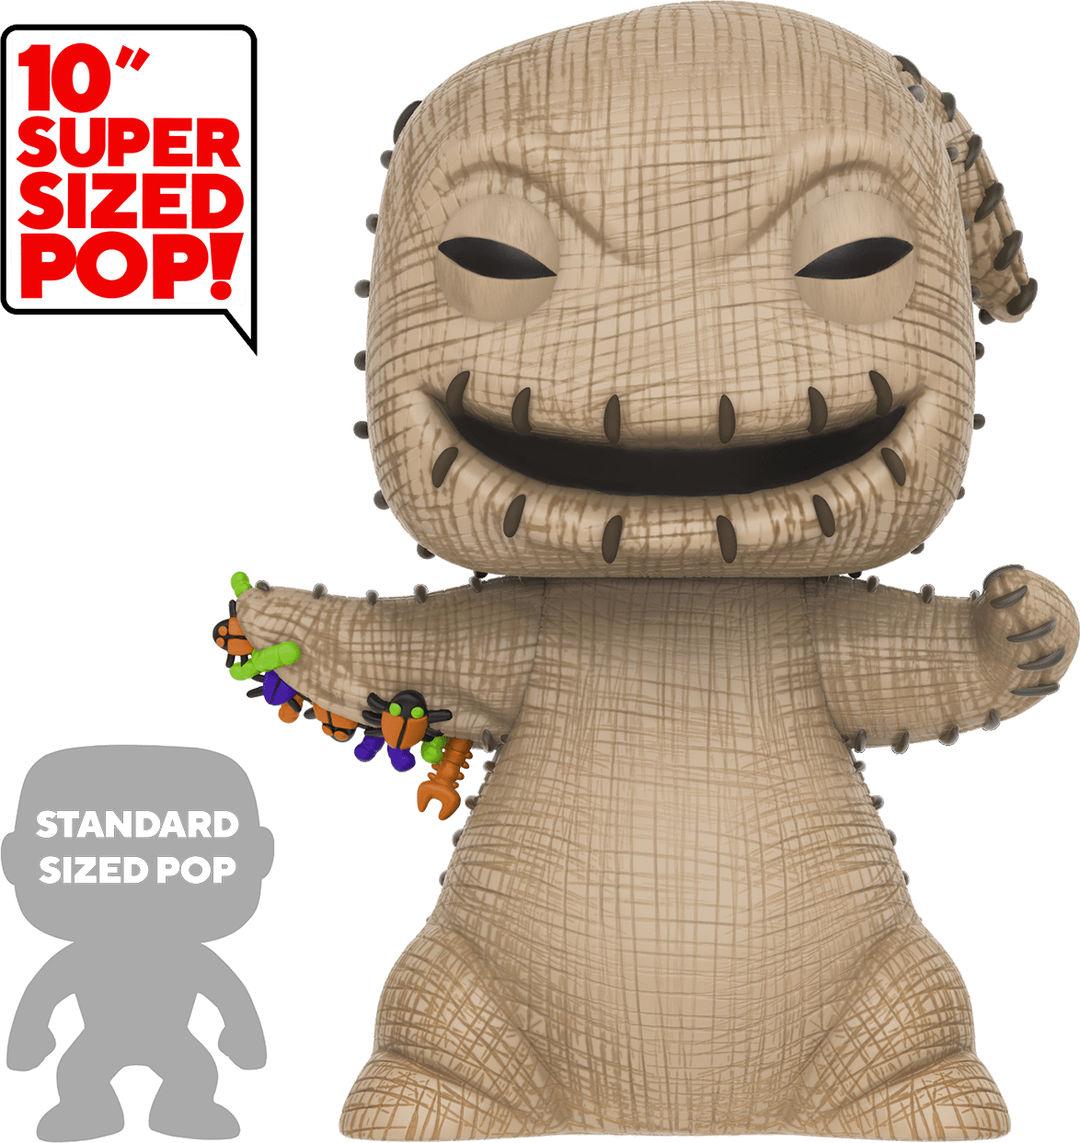 Funko Pop! Disney The Nightmare Before Christmas Oogie Boogie [10-Inch]